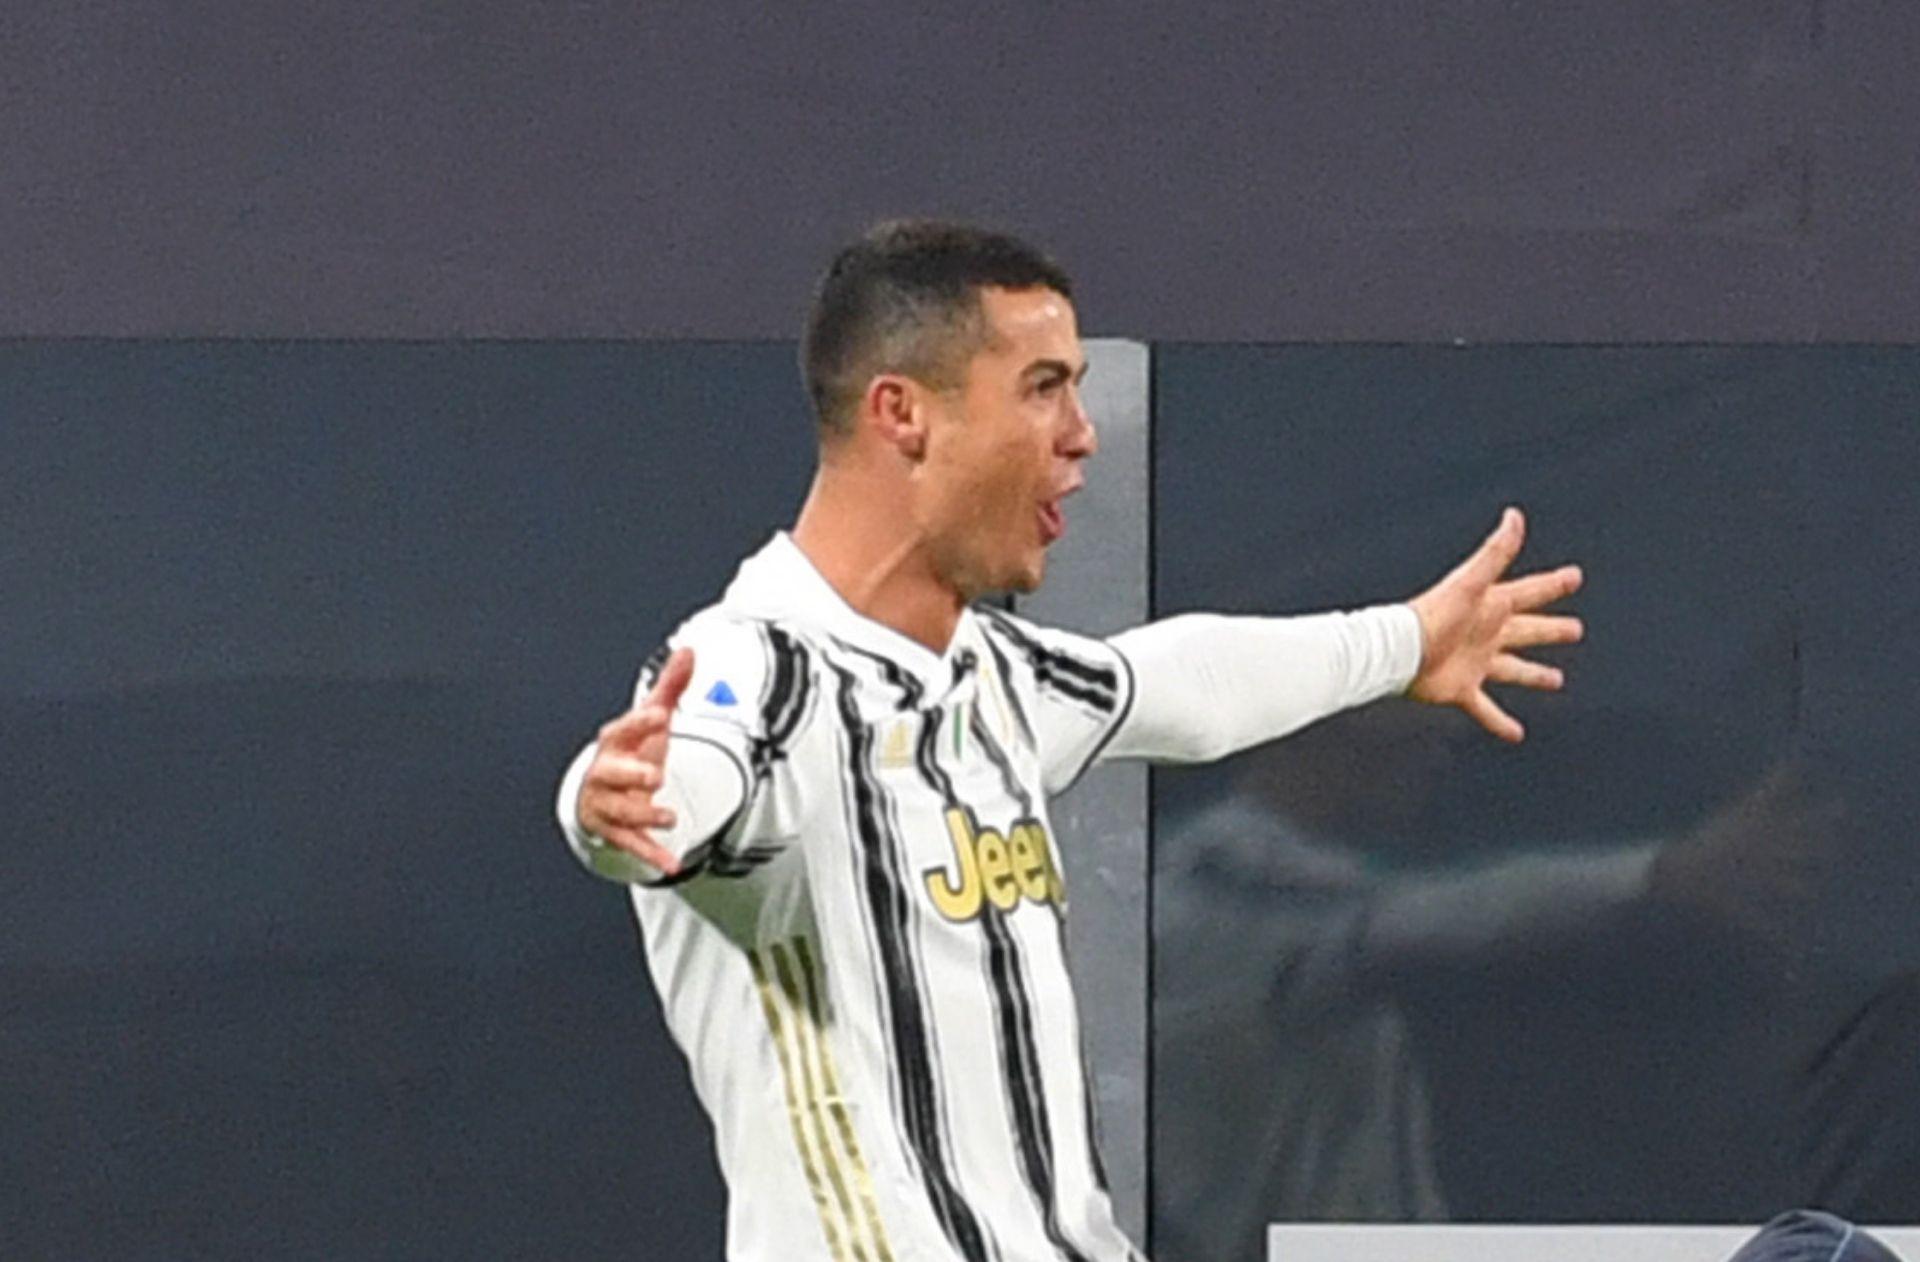 Ronaldo to return to Juve starting XI against Dynamo Kyiv - ronaldo.com